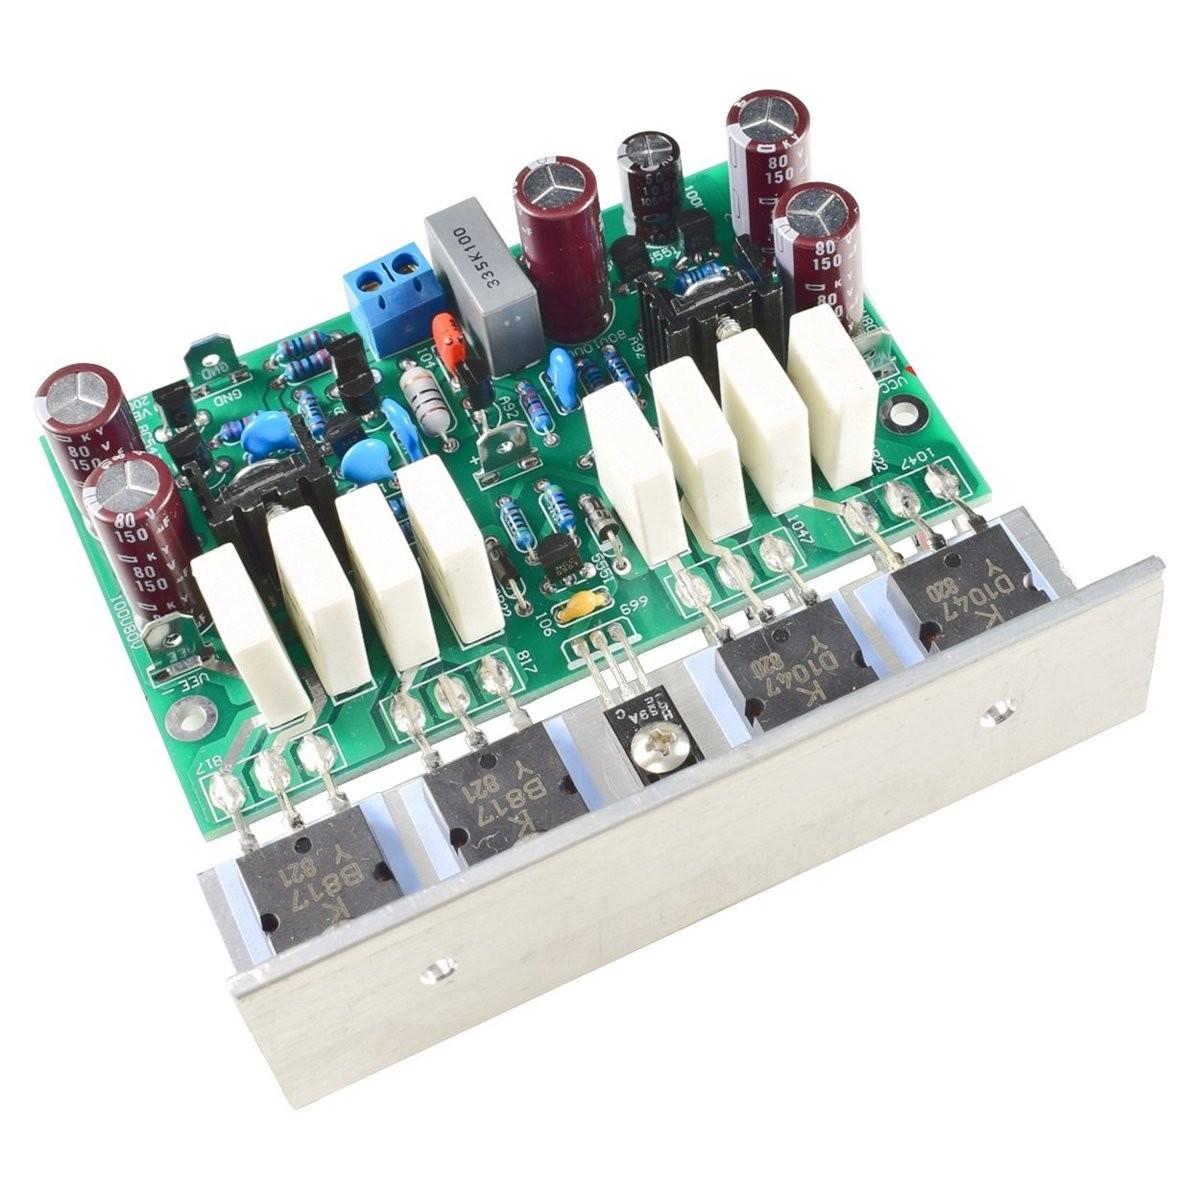 LJ L20 V10 Amplifier boards 200W 8 ohm mono (Pair)